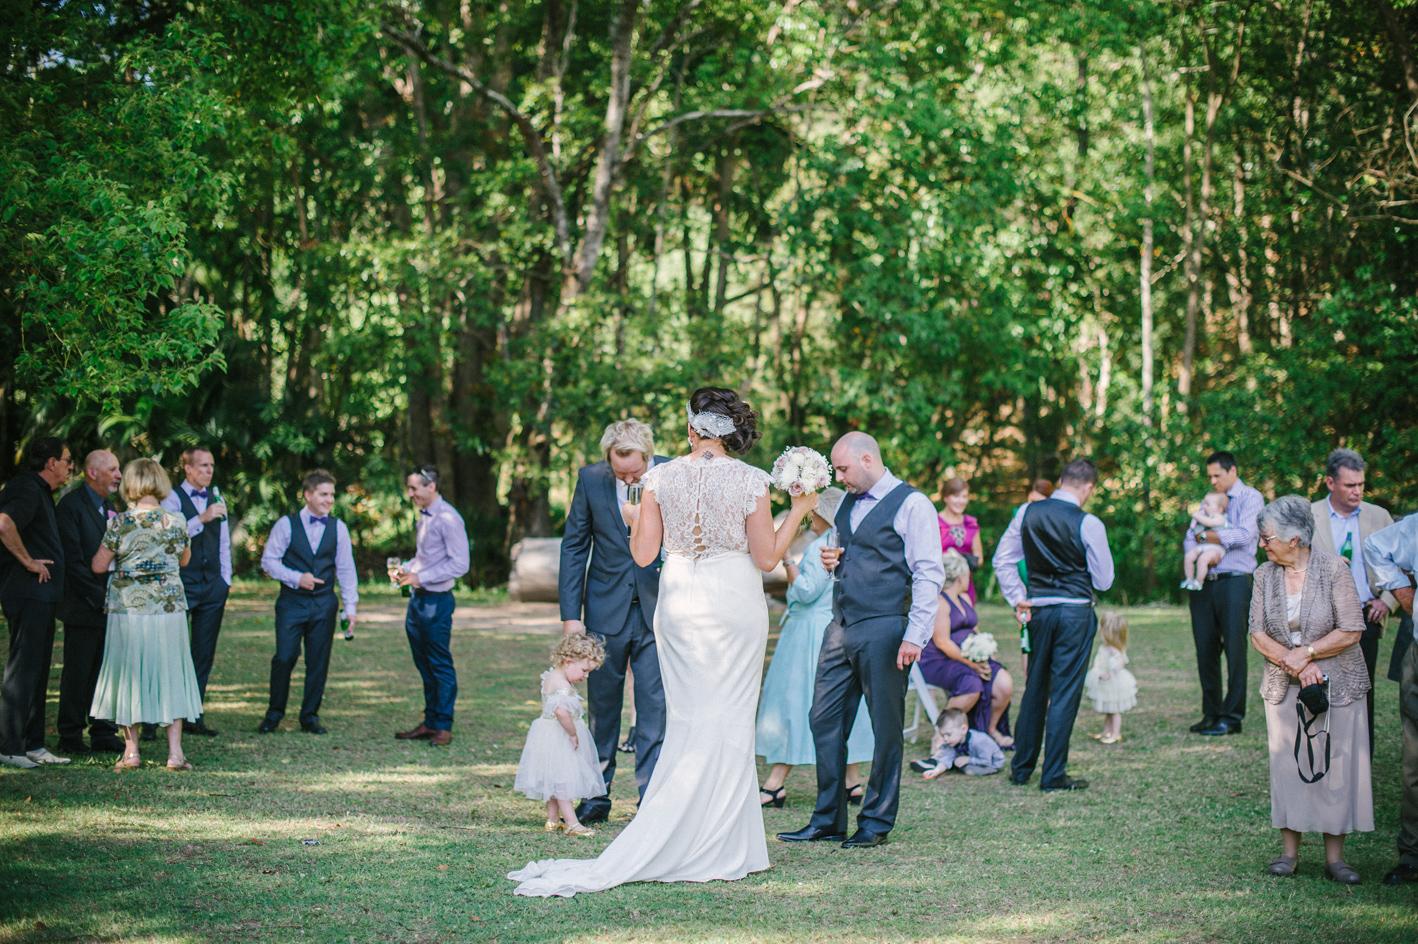 045-hannah-daniel-boomerang-farm-wedding-sophie-baker-photography